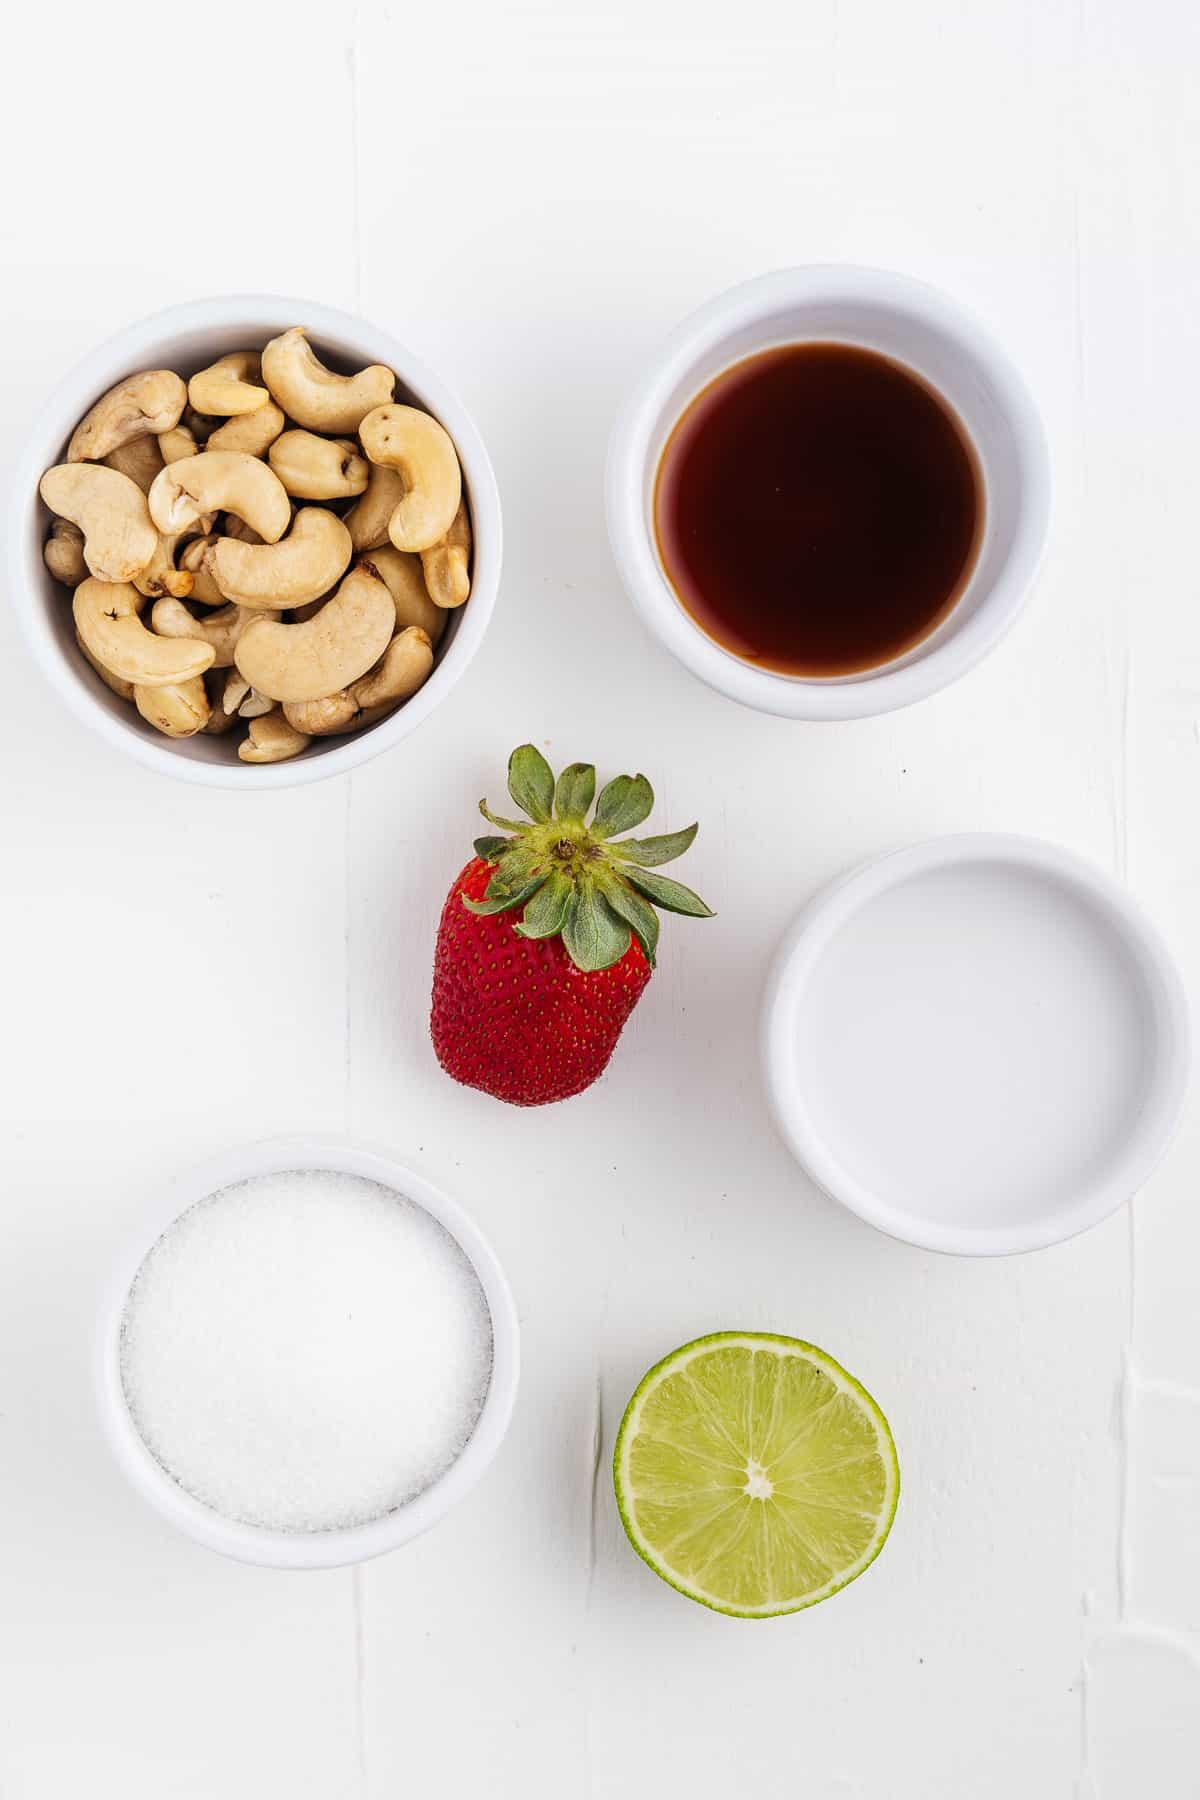 Lime, Sugar, Coconut Milk, Strawberry, Vanilla, and Cashews